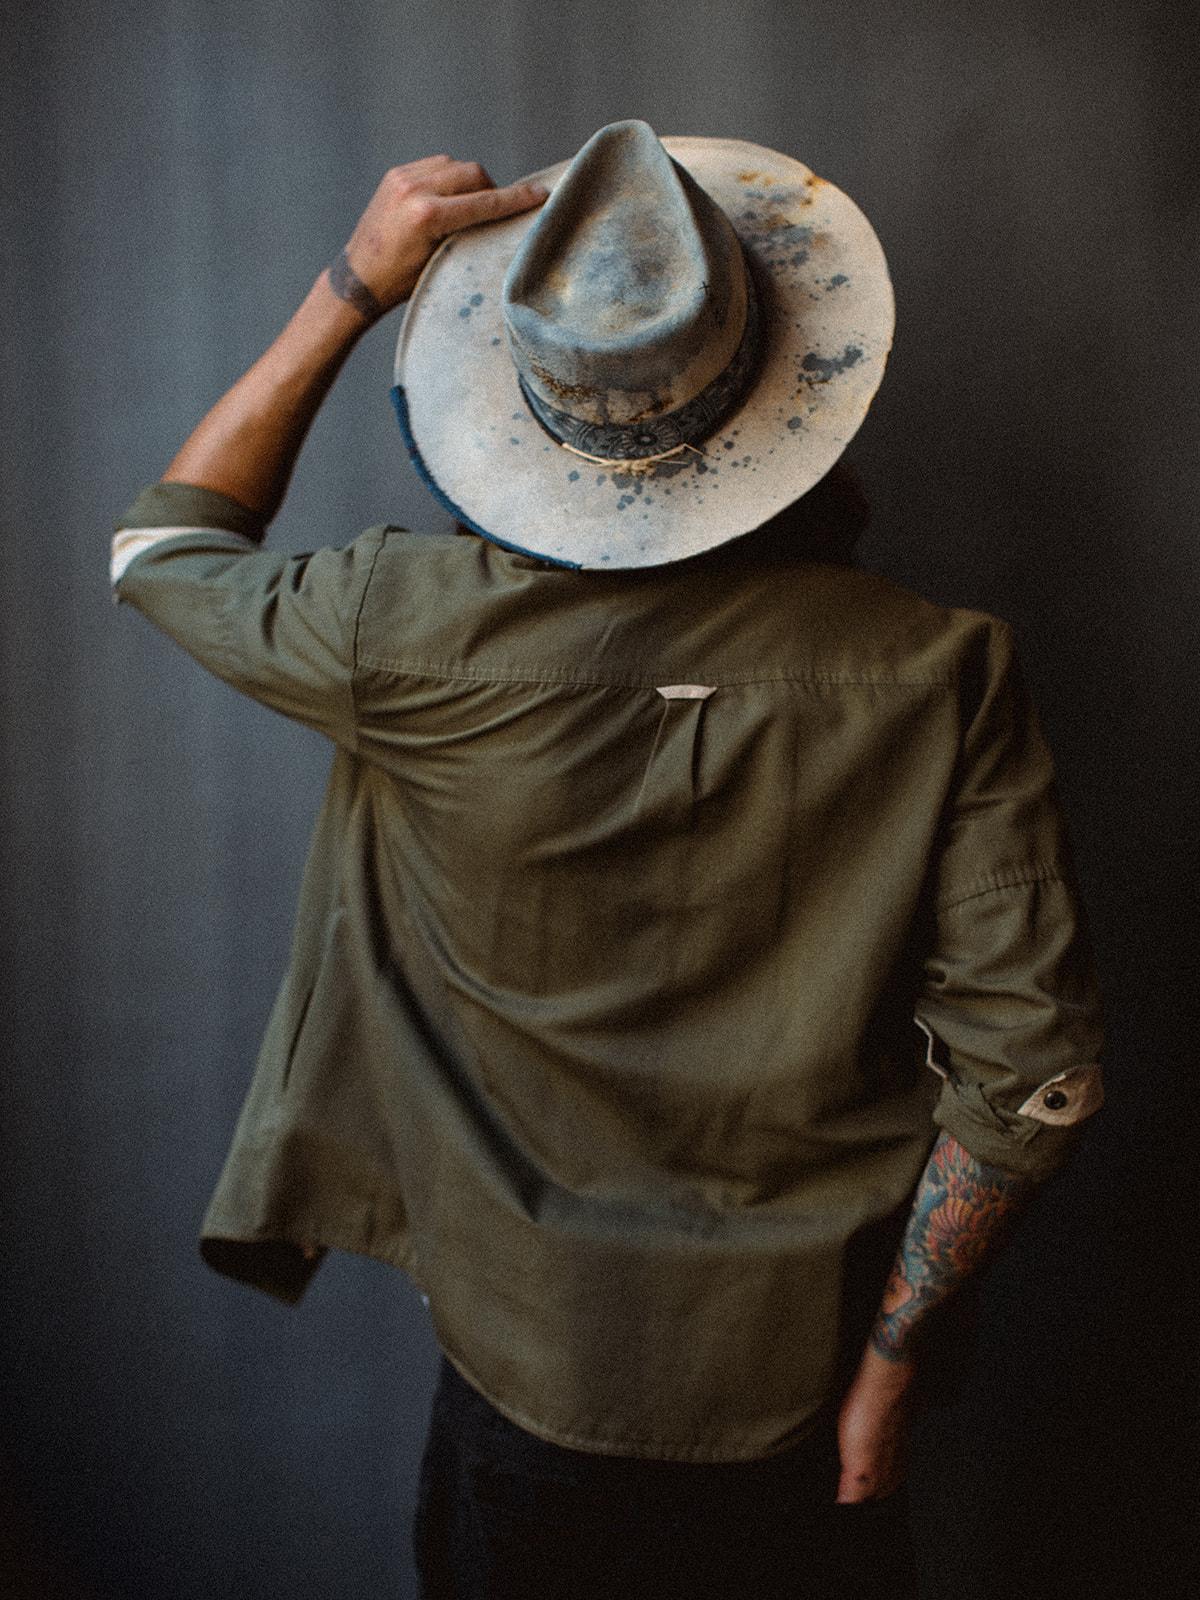 teressa foglia new york city hat designer lookbook-152.jpg